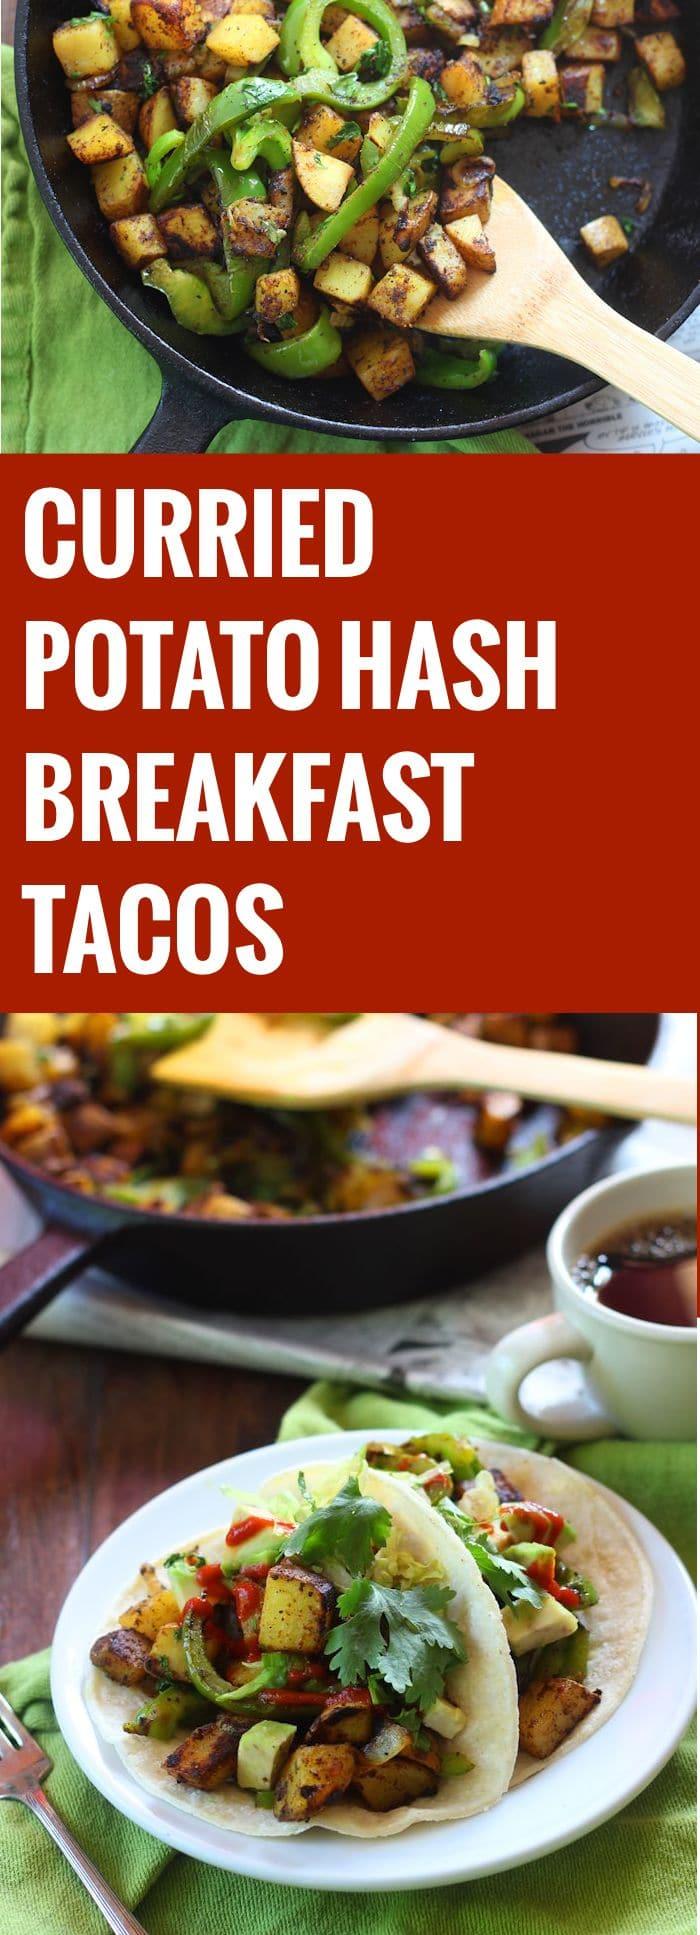 Curried Potato Hash Tacos